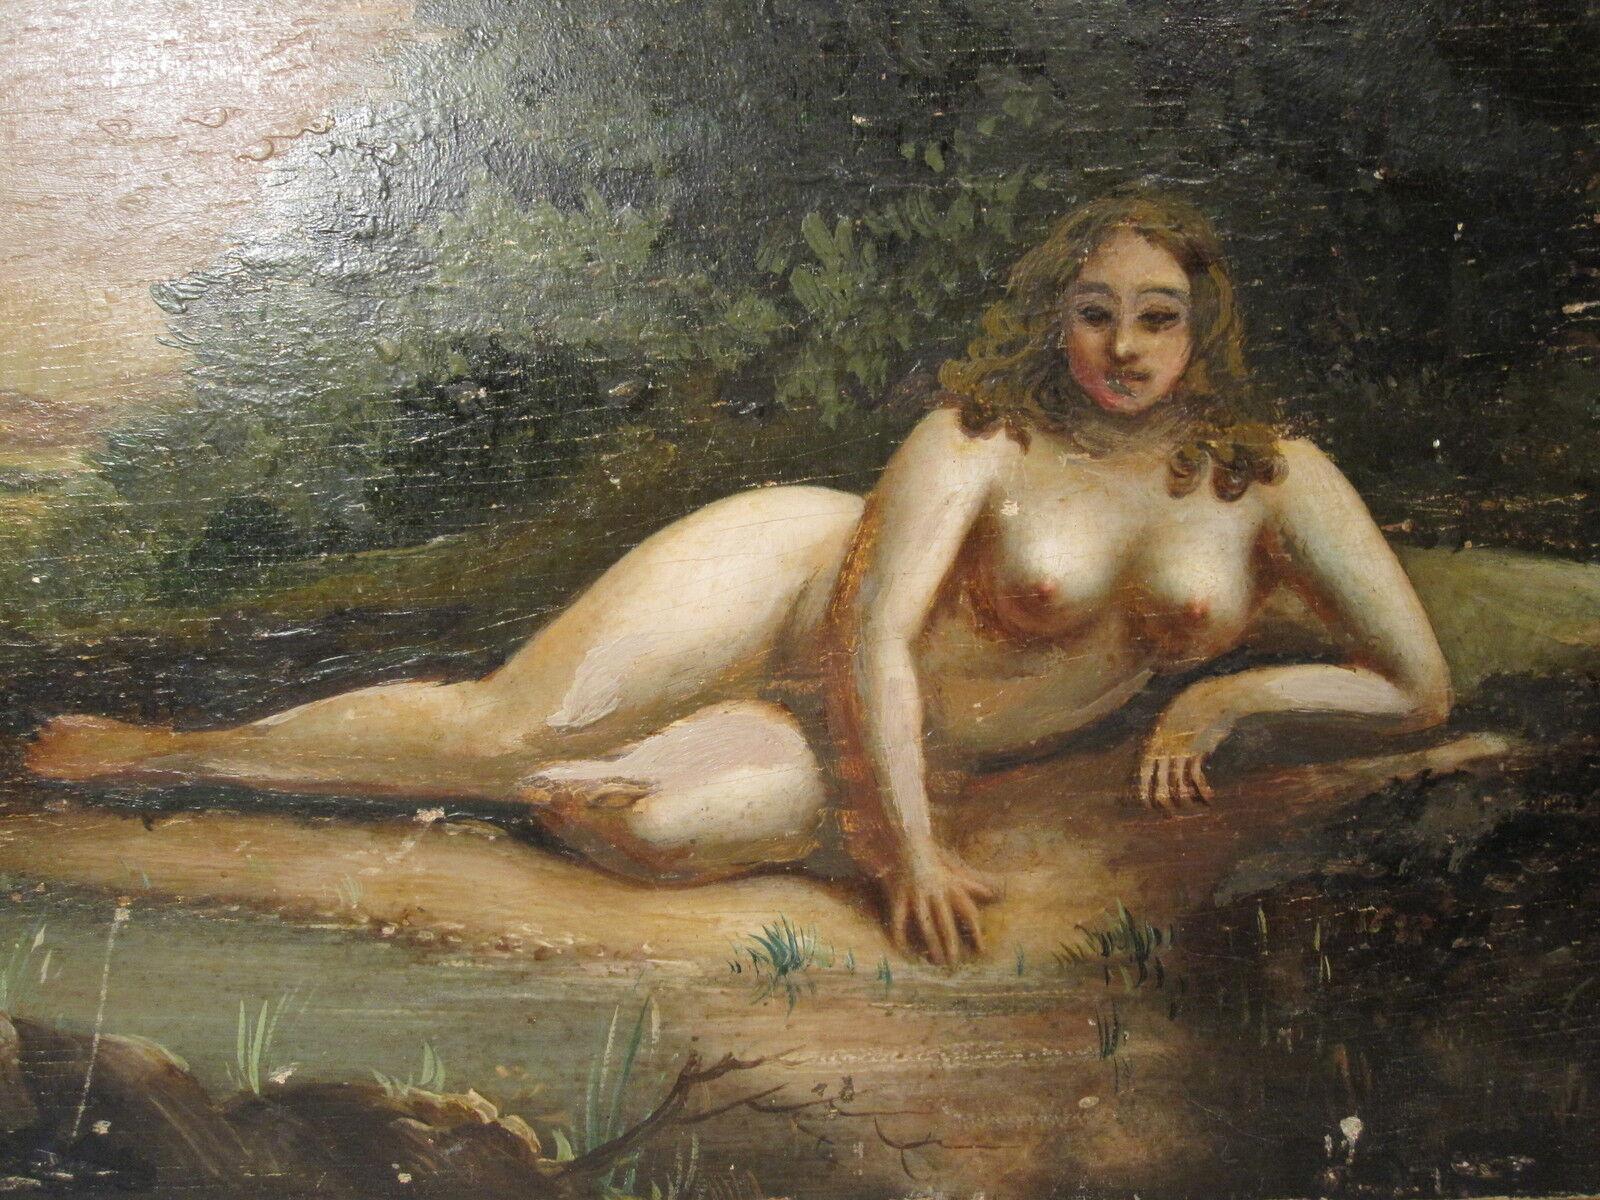 Antik 19th Amerikanische Volkskunst Rubenesque Nude Busen Blond Beauty Malerei